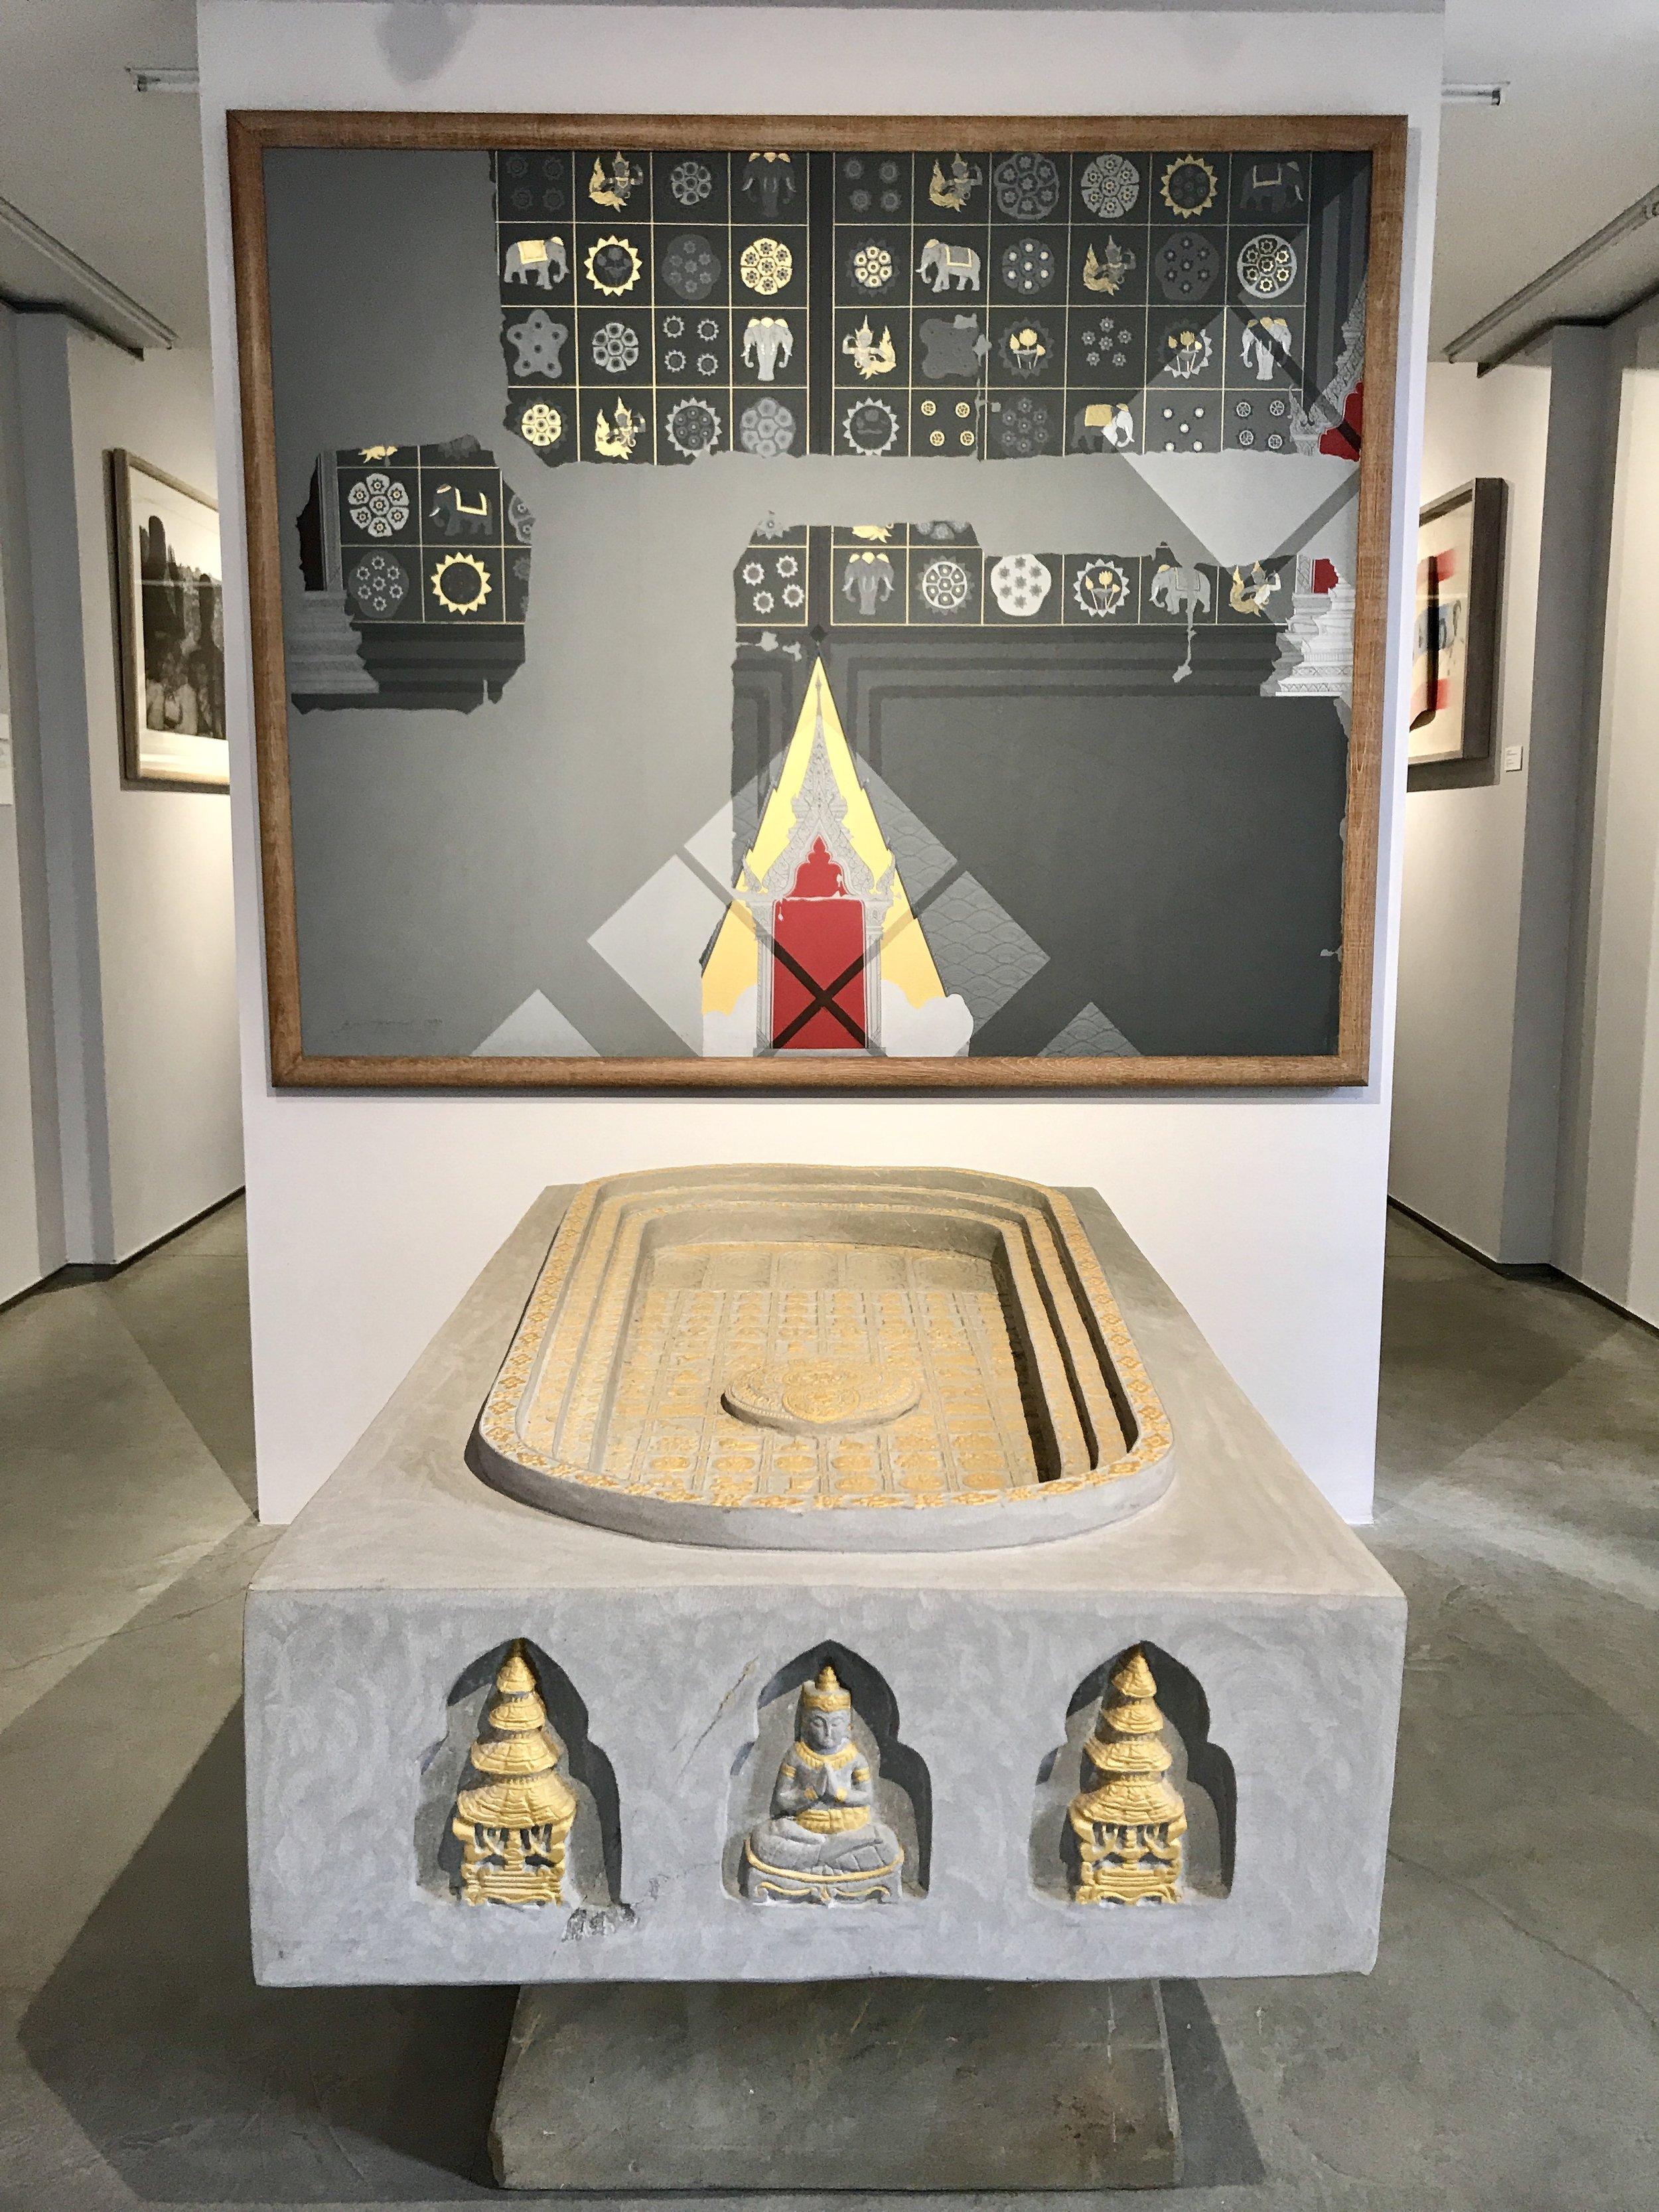 Buddhapada (Footprint of the Buddha)